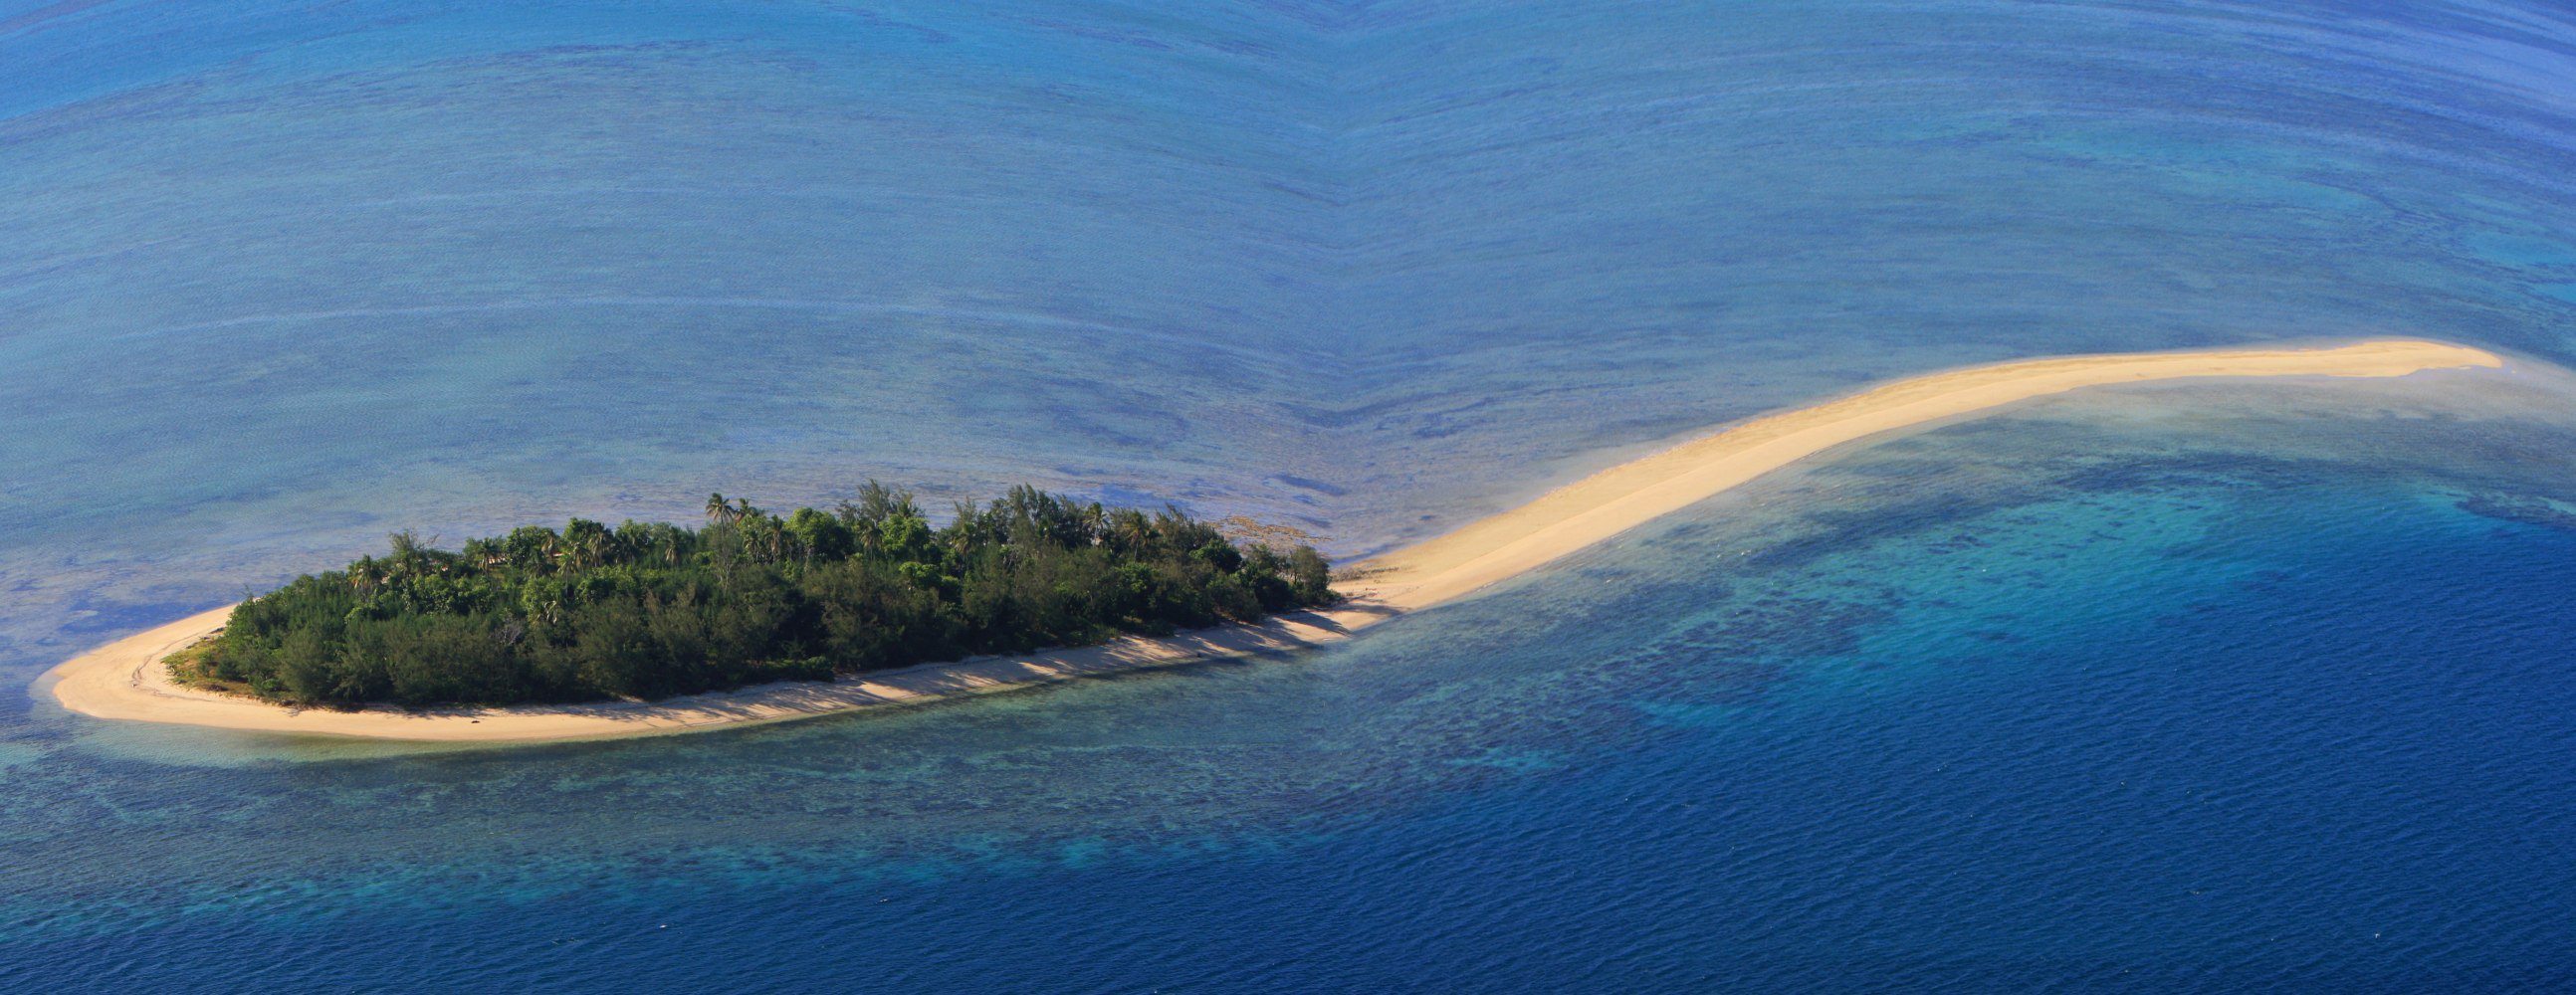 Caribbean Island Rental Properties